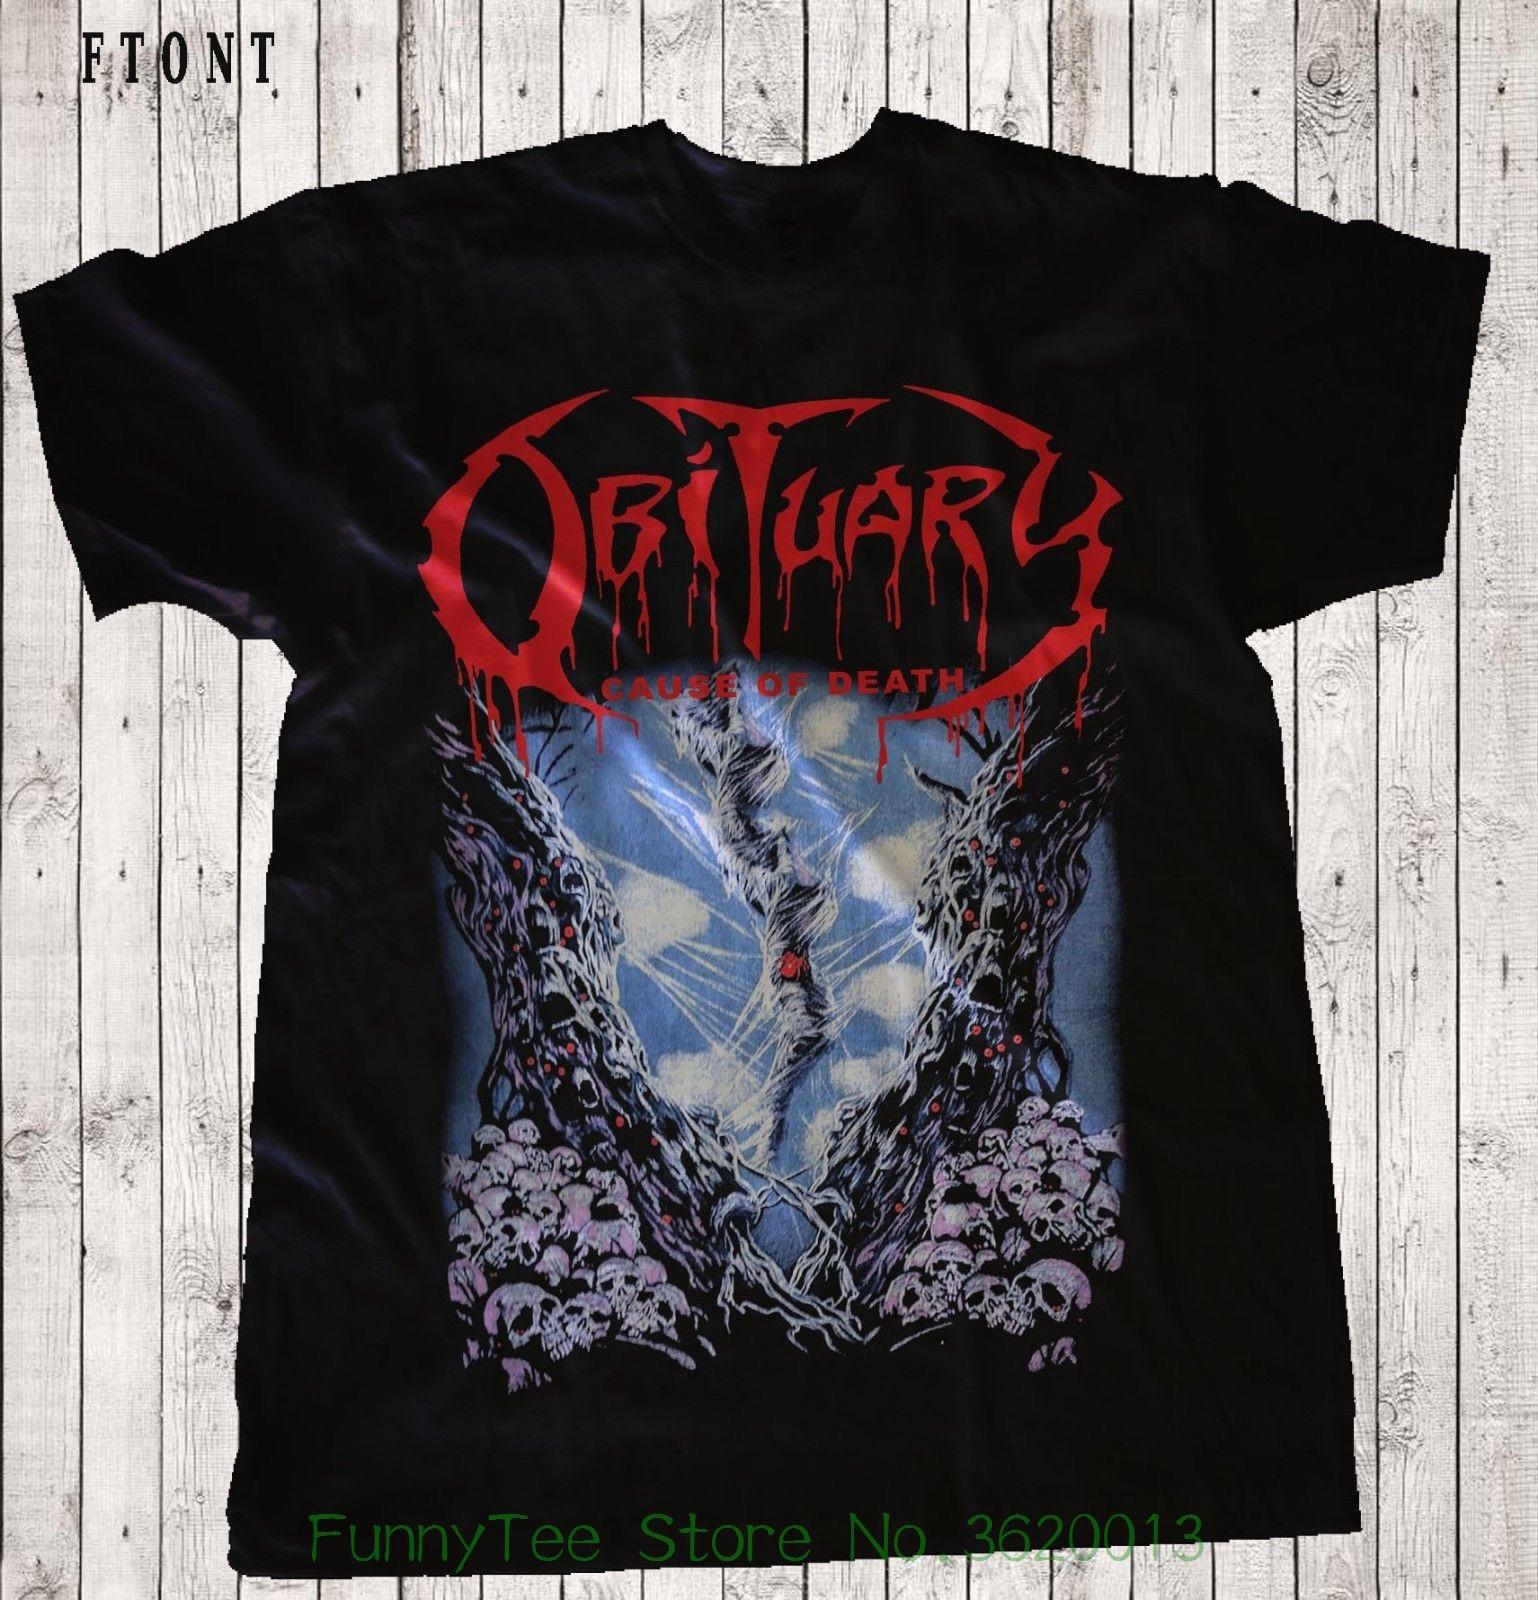 Obituary - cause Of Death - death Metal - deicide - < Wbr / > Death , T _ Shirt - sizes : < Wbr / > S To 7xl